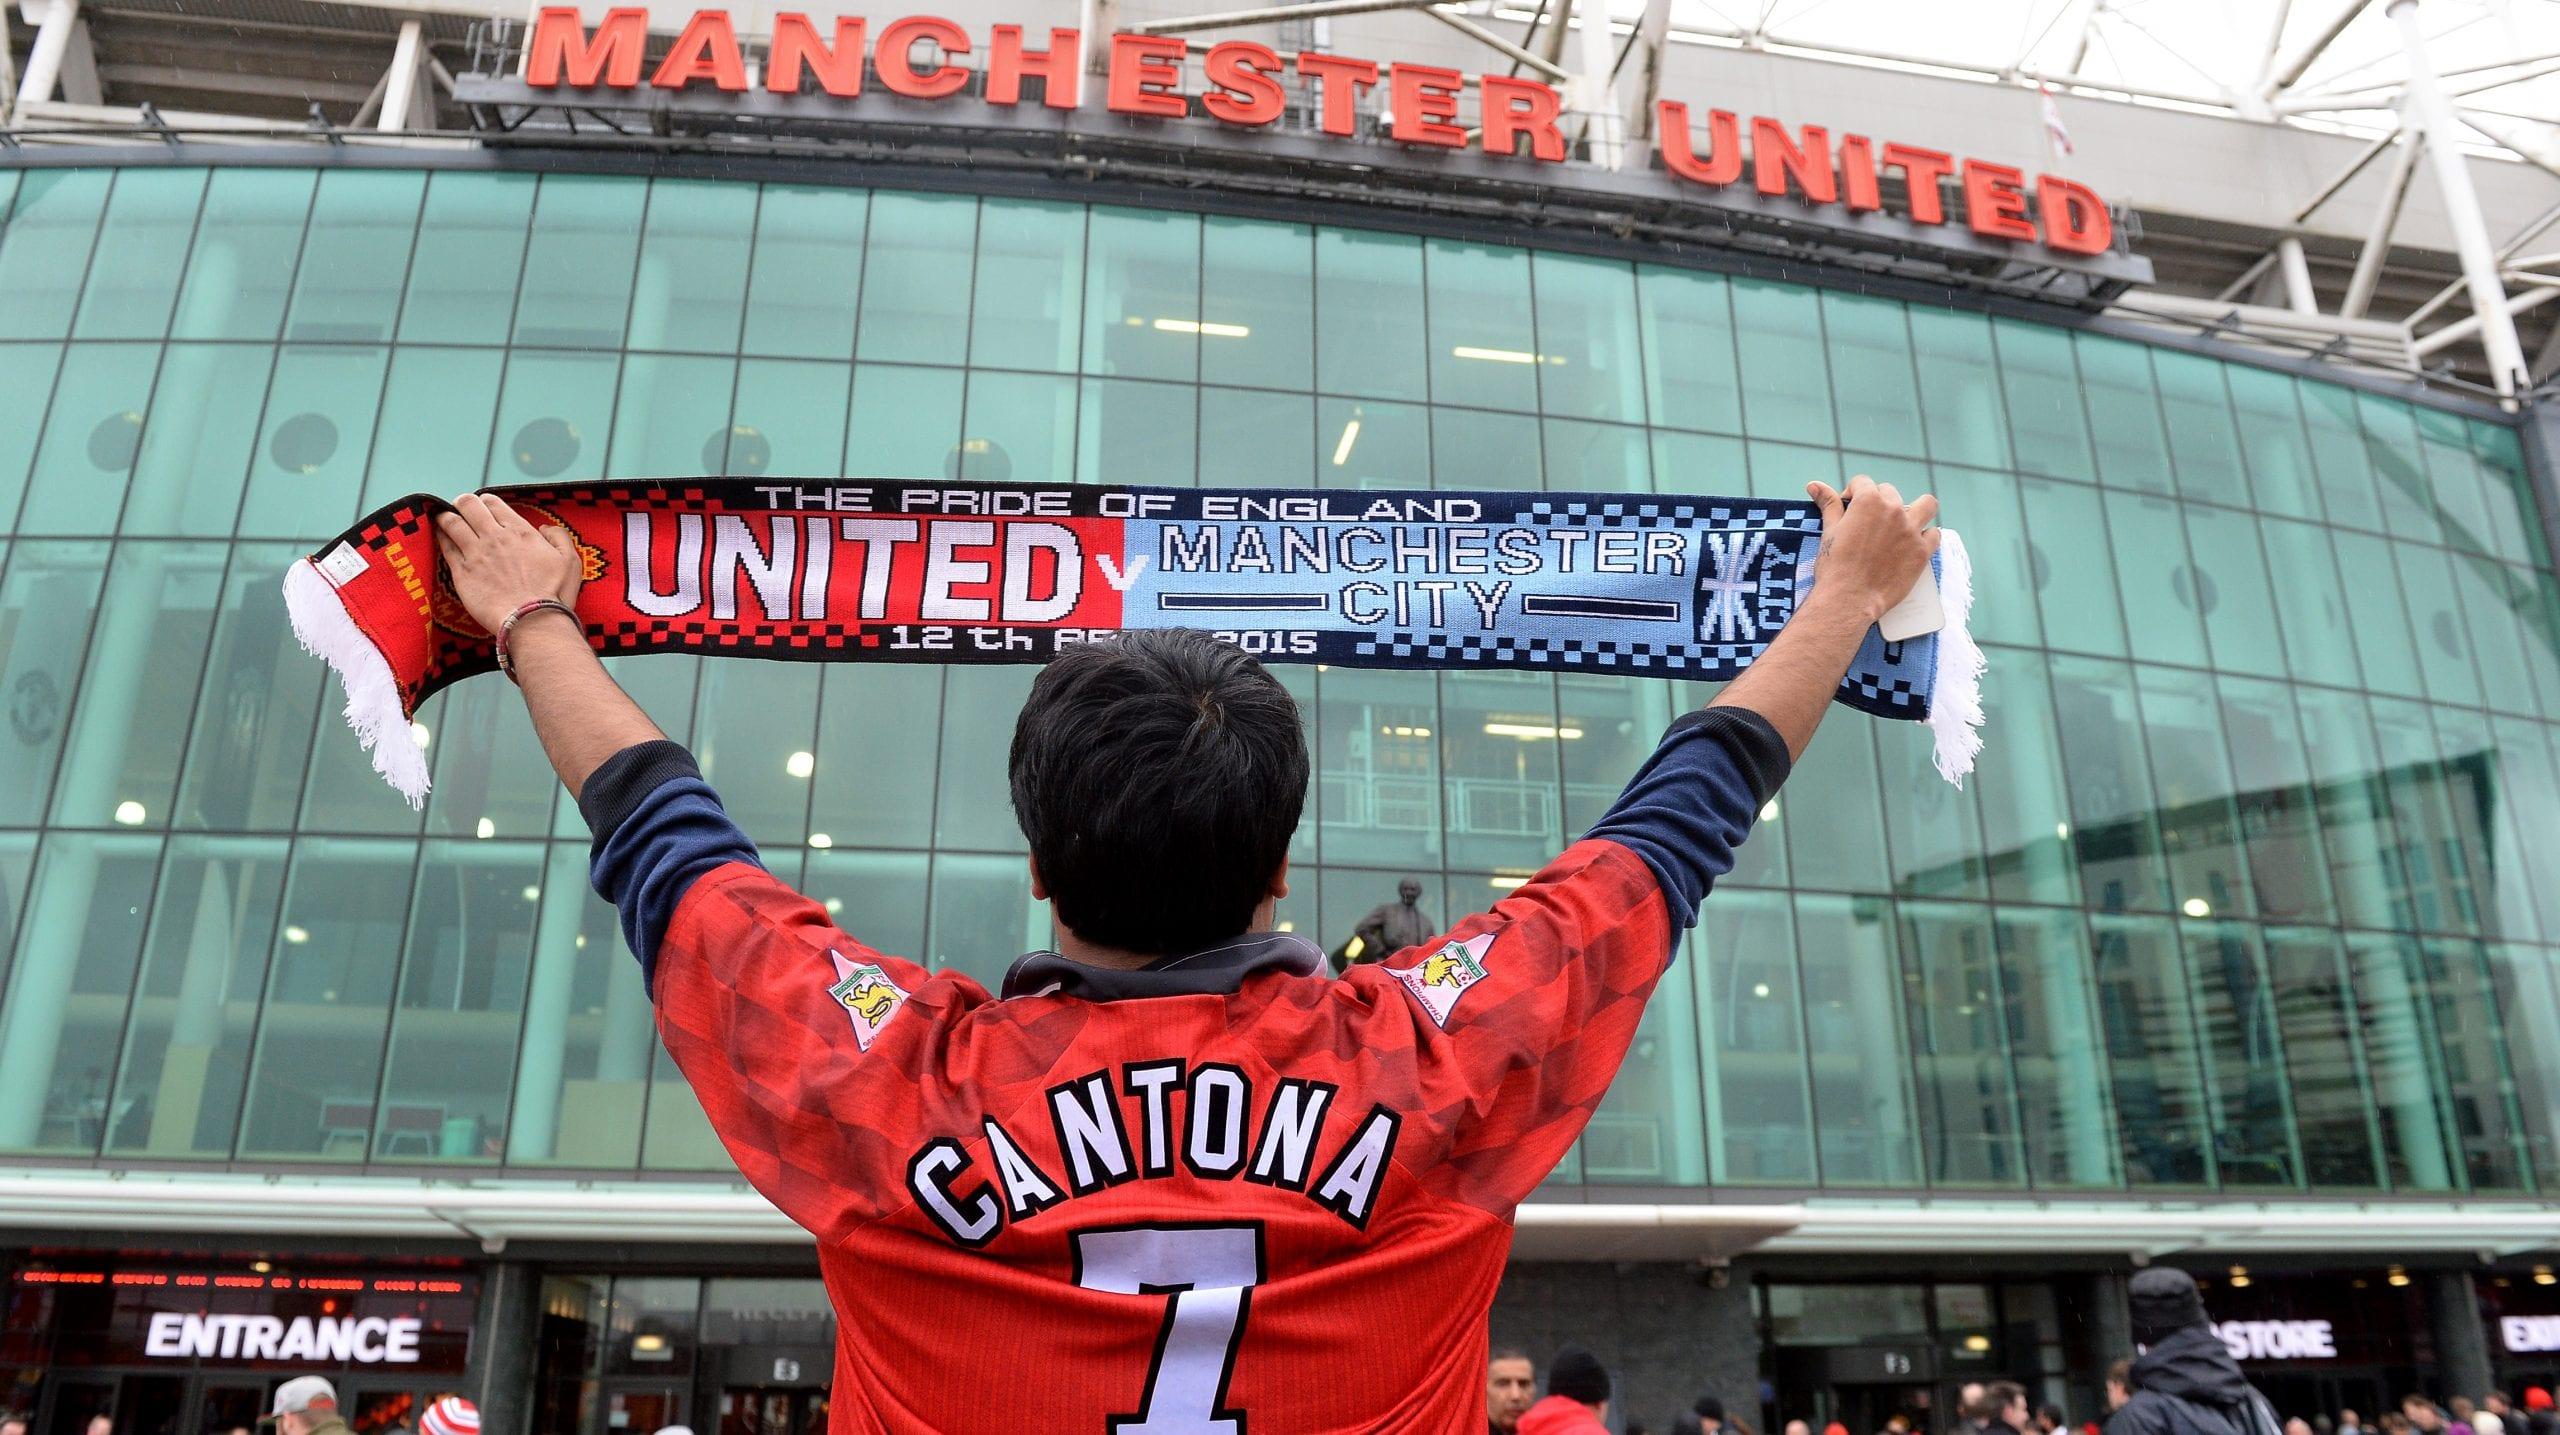 Previu EPL: 5 Perkara Penting Menjelang Perlawanan Pertama Derby Manchester 2016